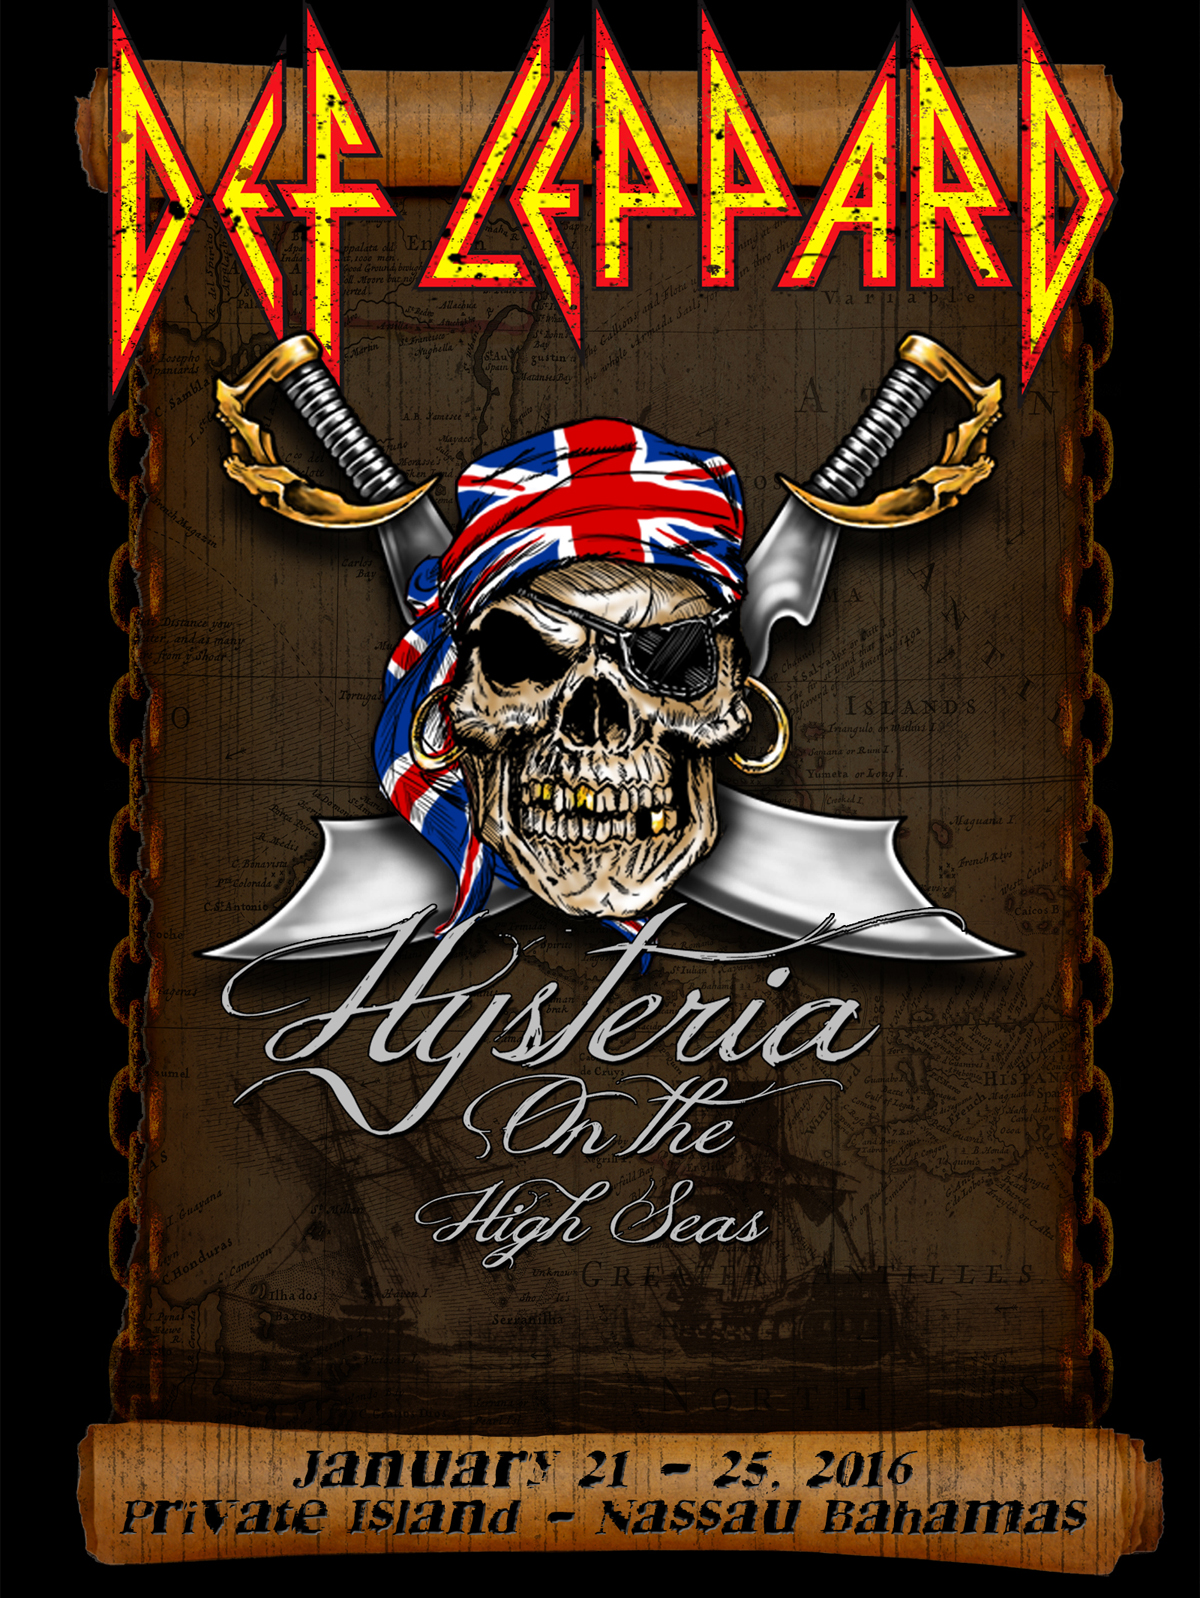 Def Leppard Announce Hysteria On The High Seas Cruise